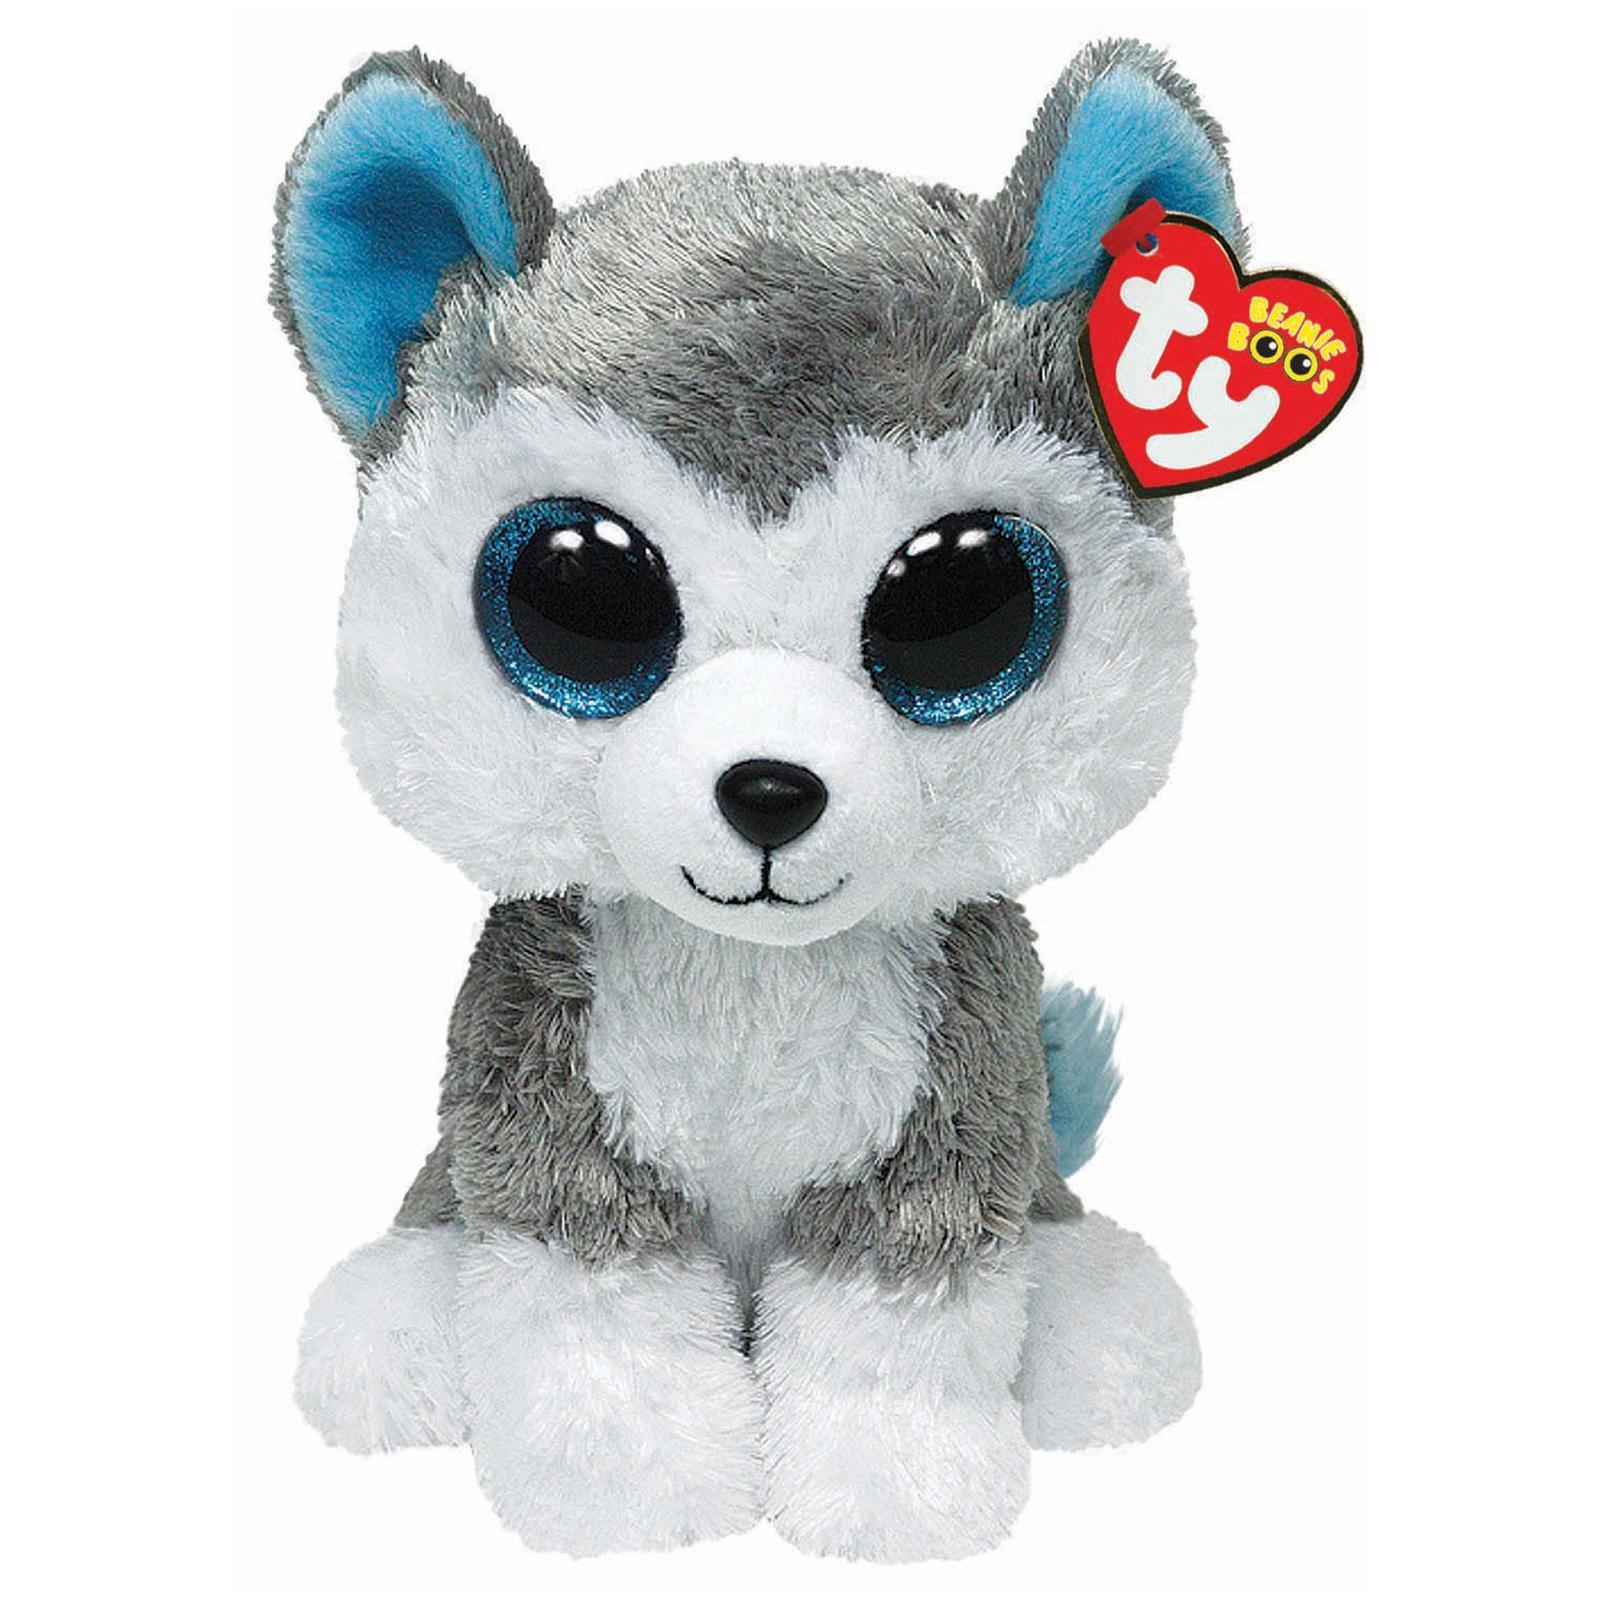 TY Beanie Boo's - Slush the Husky image